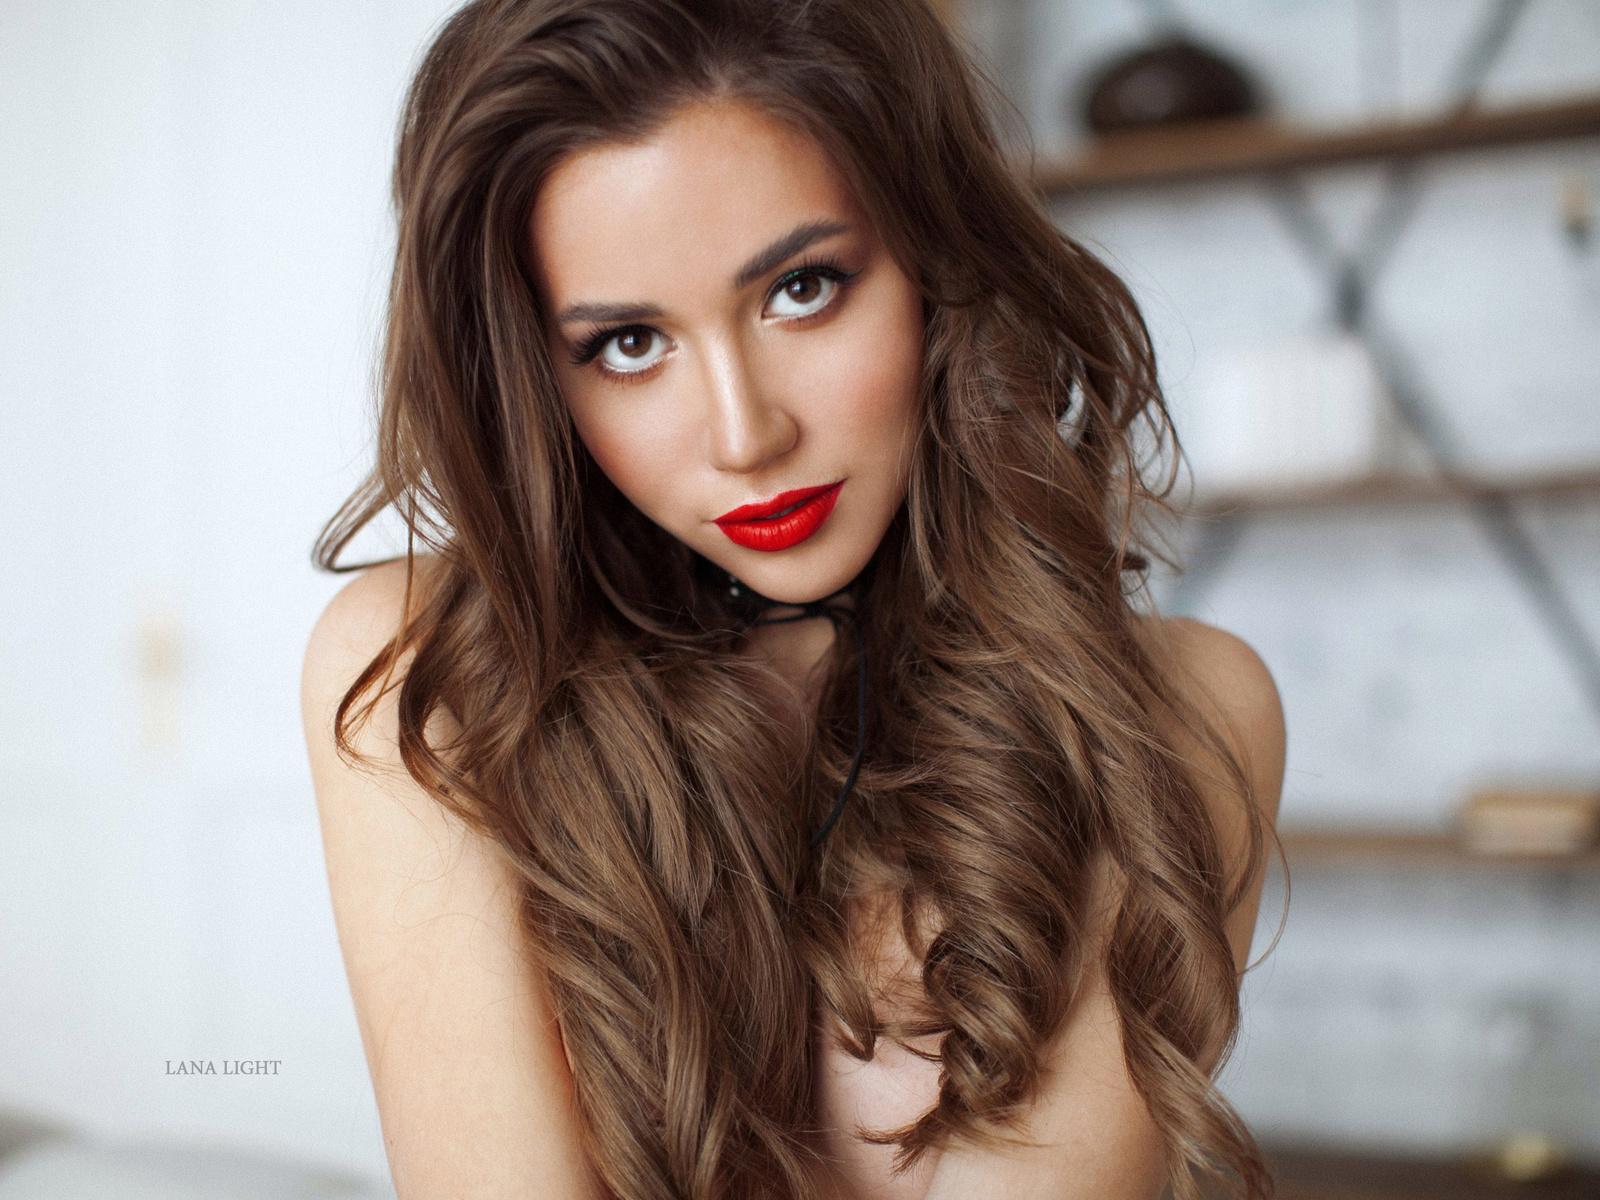 women, brunette, red lipstick, couch, portrait, boobs, long hair, brown eyes, women indoors